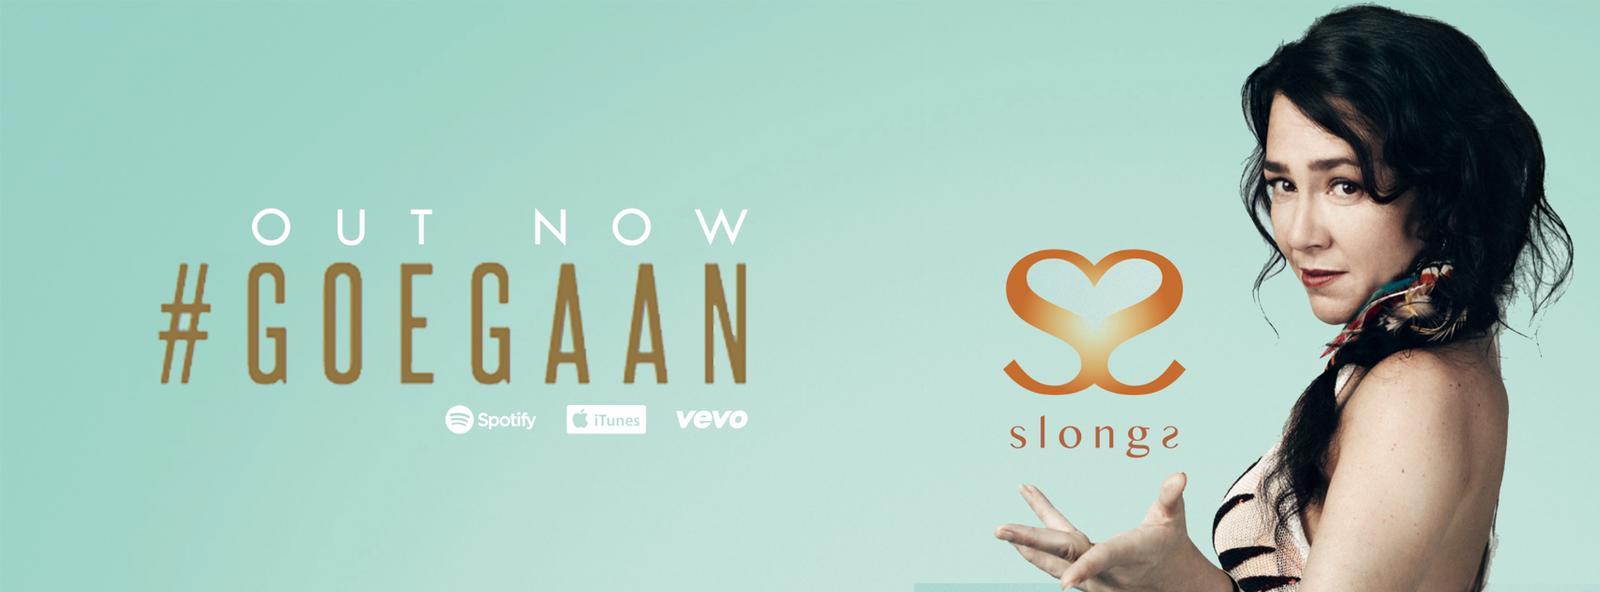 Slong Release Show.jpg